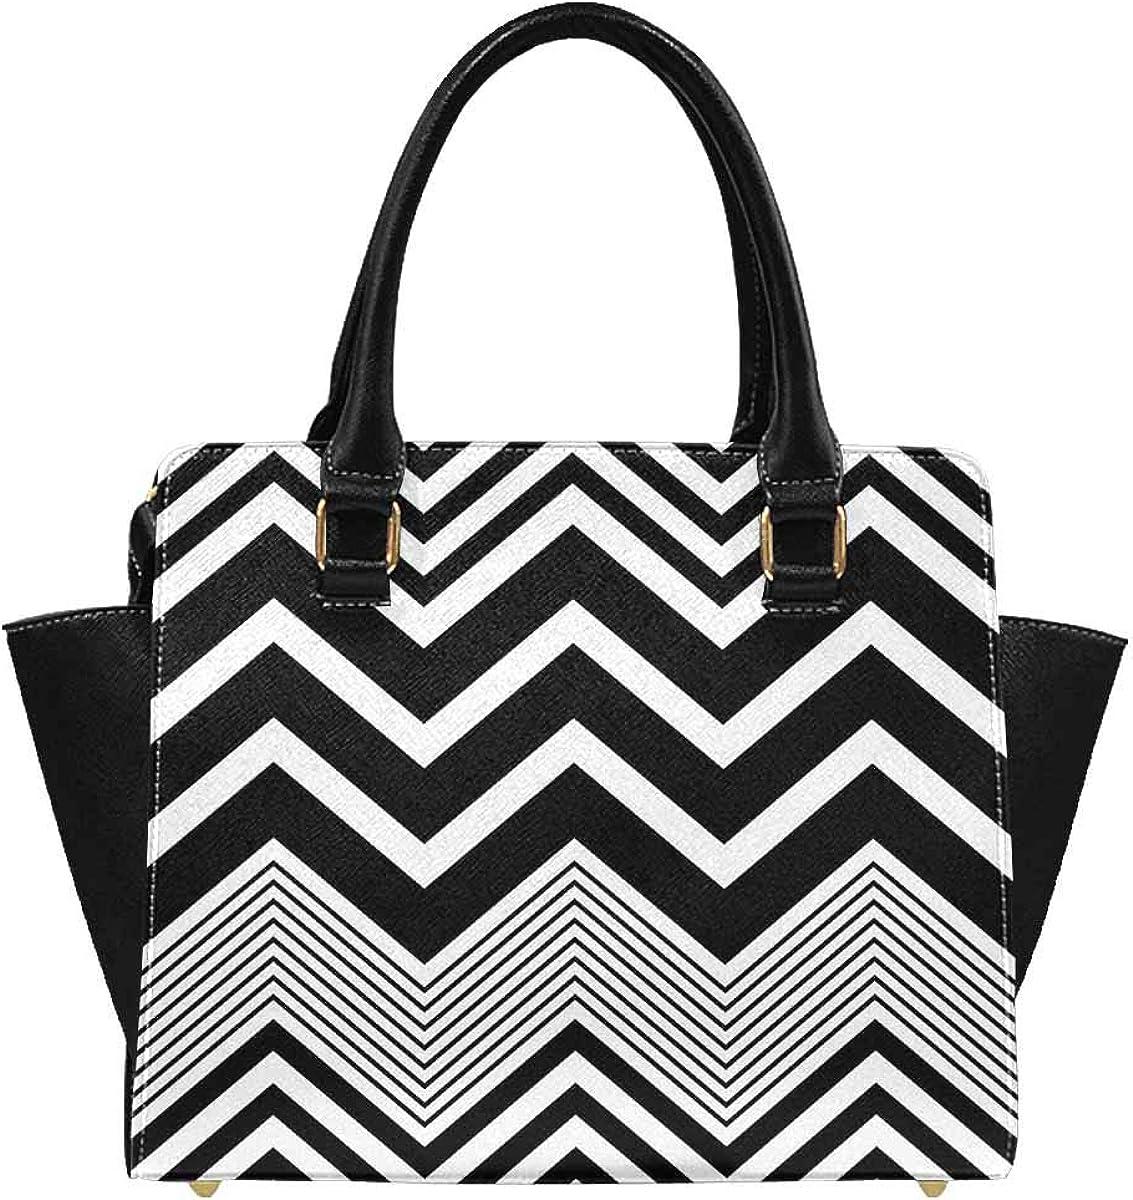 InterestPrint Womens Zebra Texture Background Rivet Shoulder Handbag Tote Bags Wallets